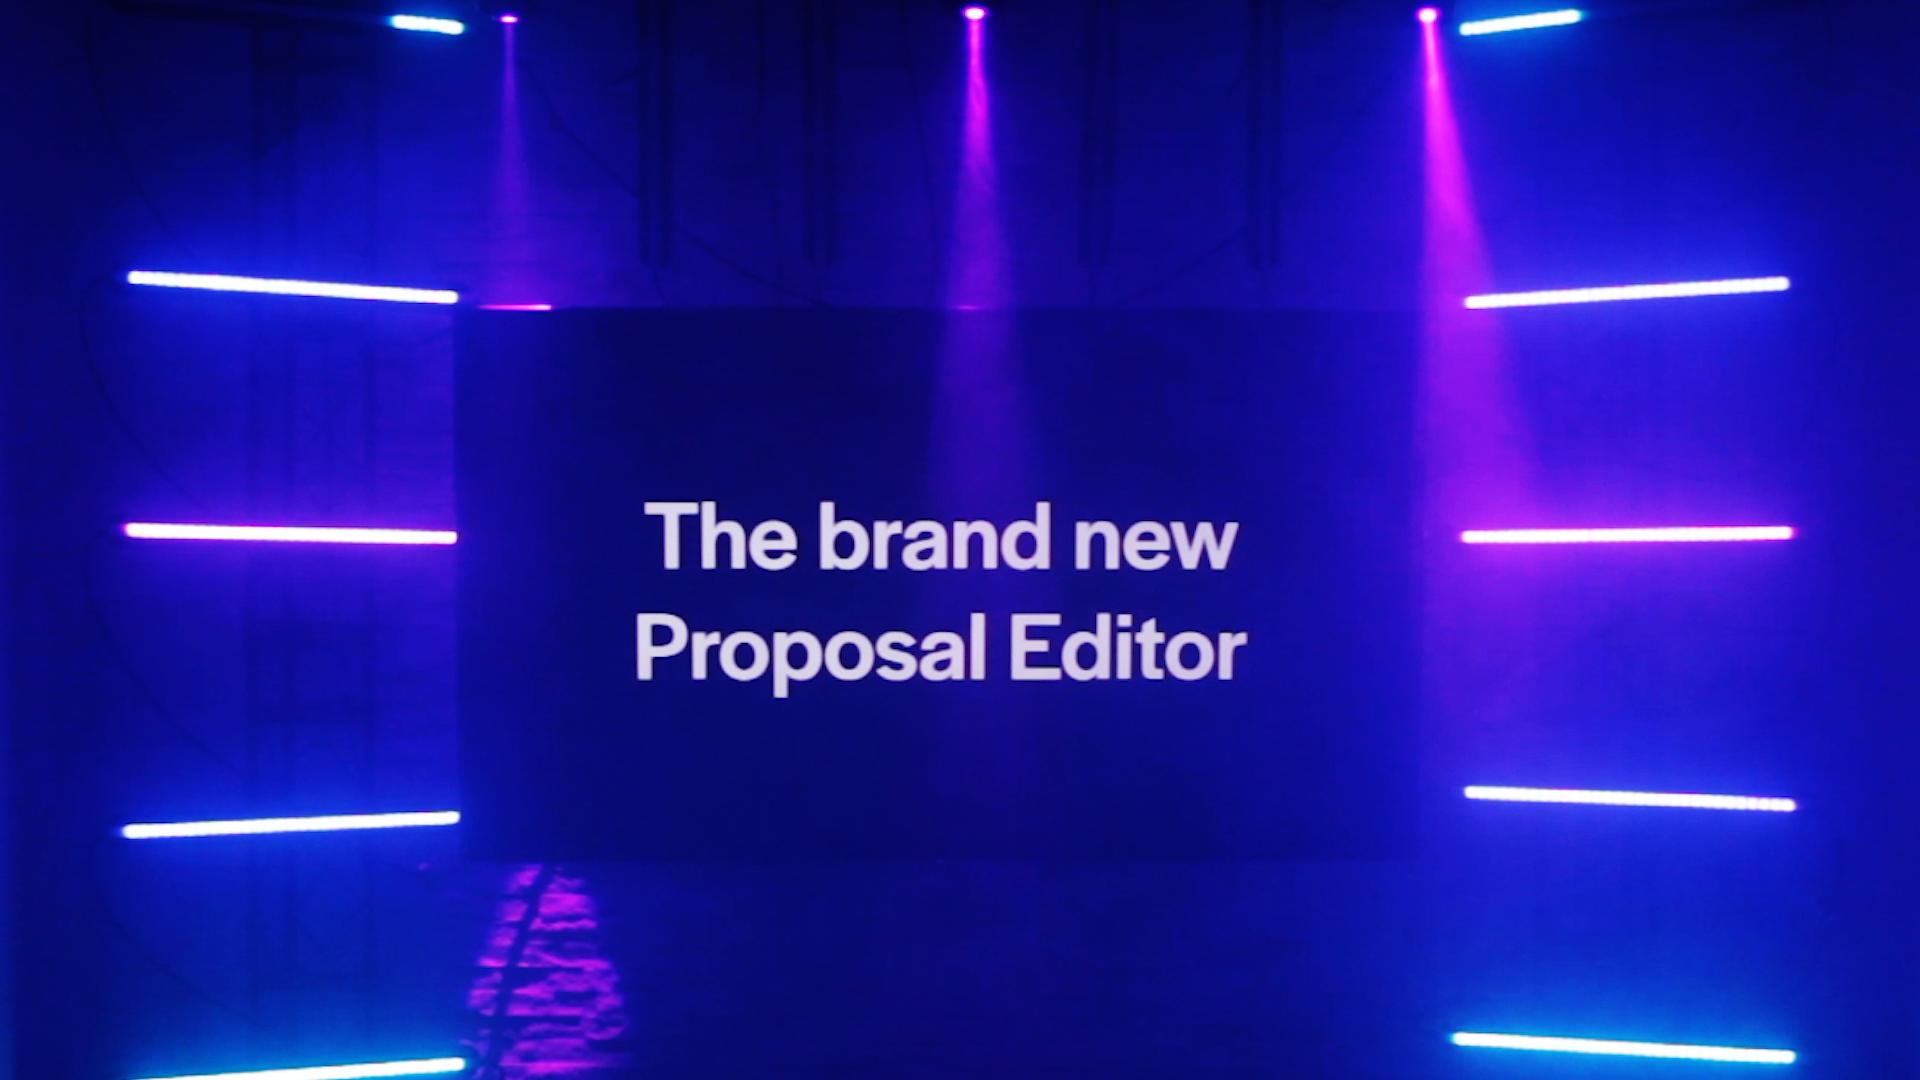 Better Proposals Editor